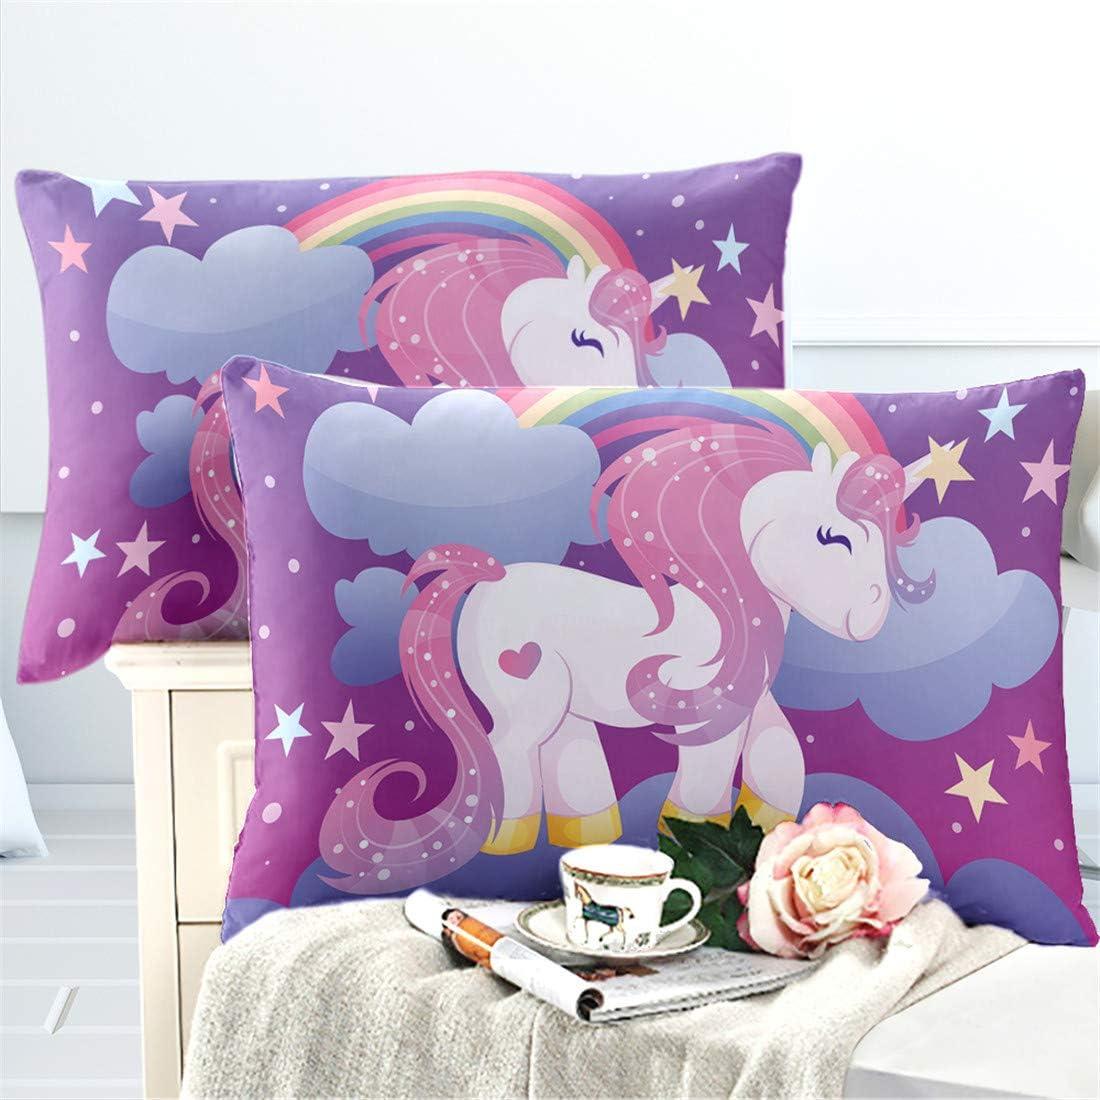 Oliven 4 Pcs Cartoon Unicorn Sheets Queen Size,Fitted Sheets Set Queen,Bed Sheets White Unicorn Floral Bedding Set Girls Gift Home Decor